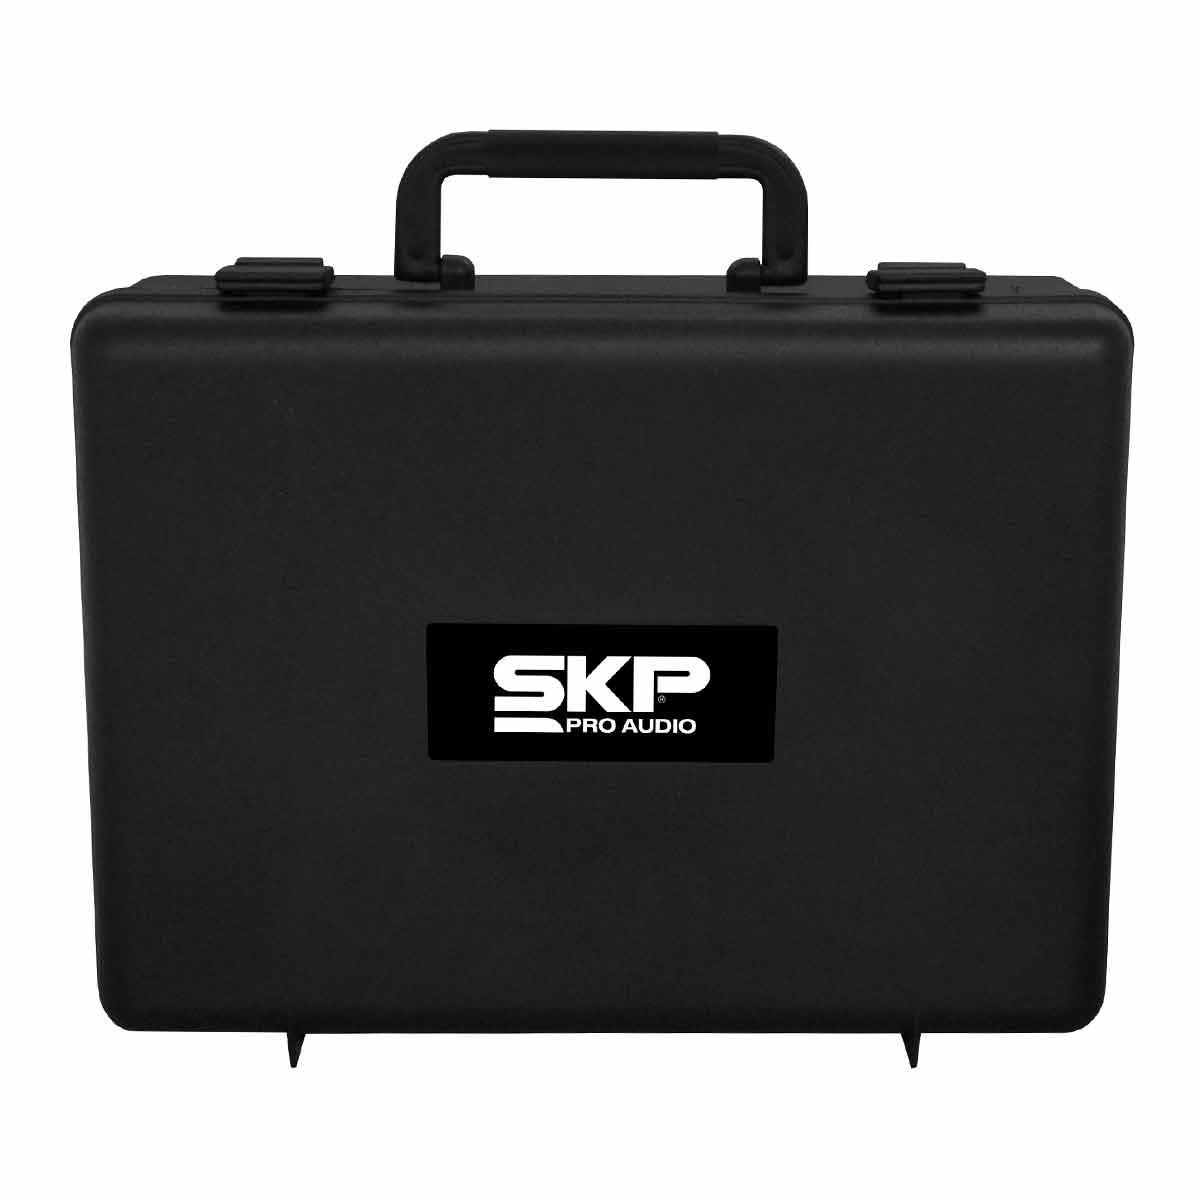 PRO7K - Microfone Gooseneck c/ Base PRO 7 K - SKP